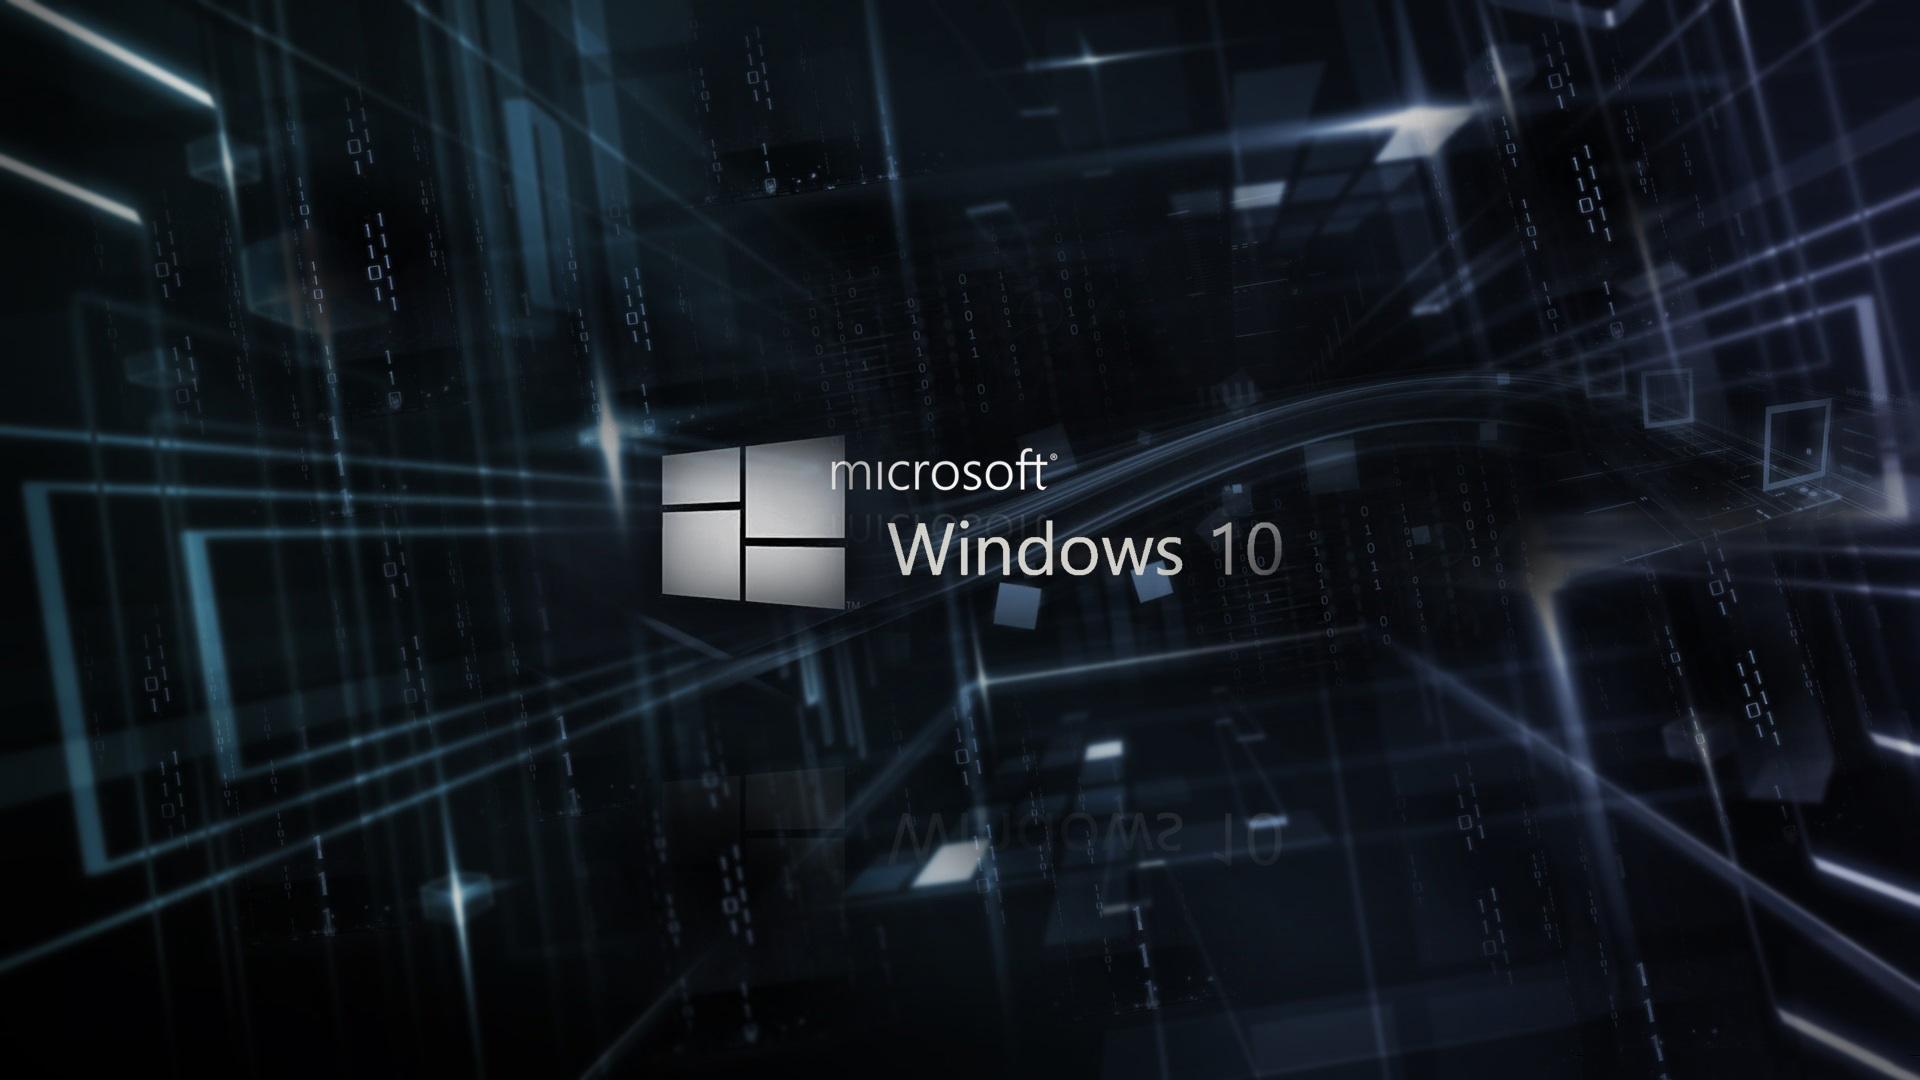 Windows 10 HD Wallpaper Full HD Pictures 1920x1080